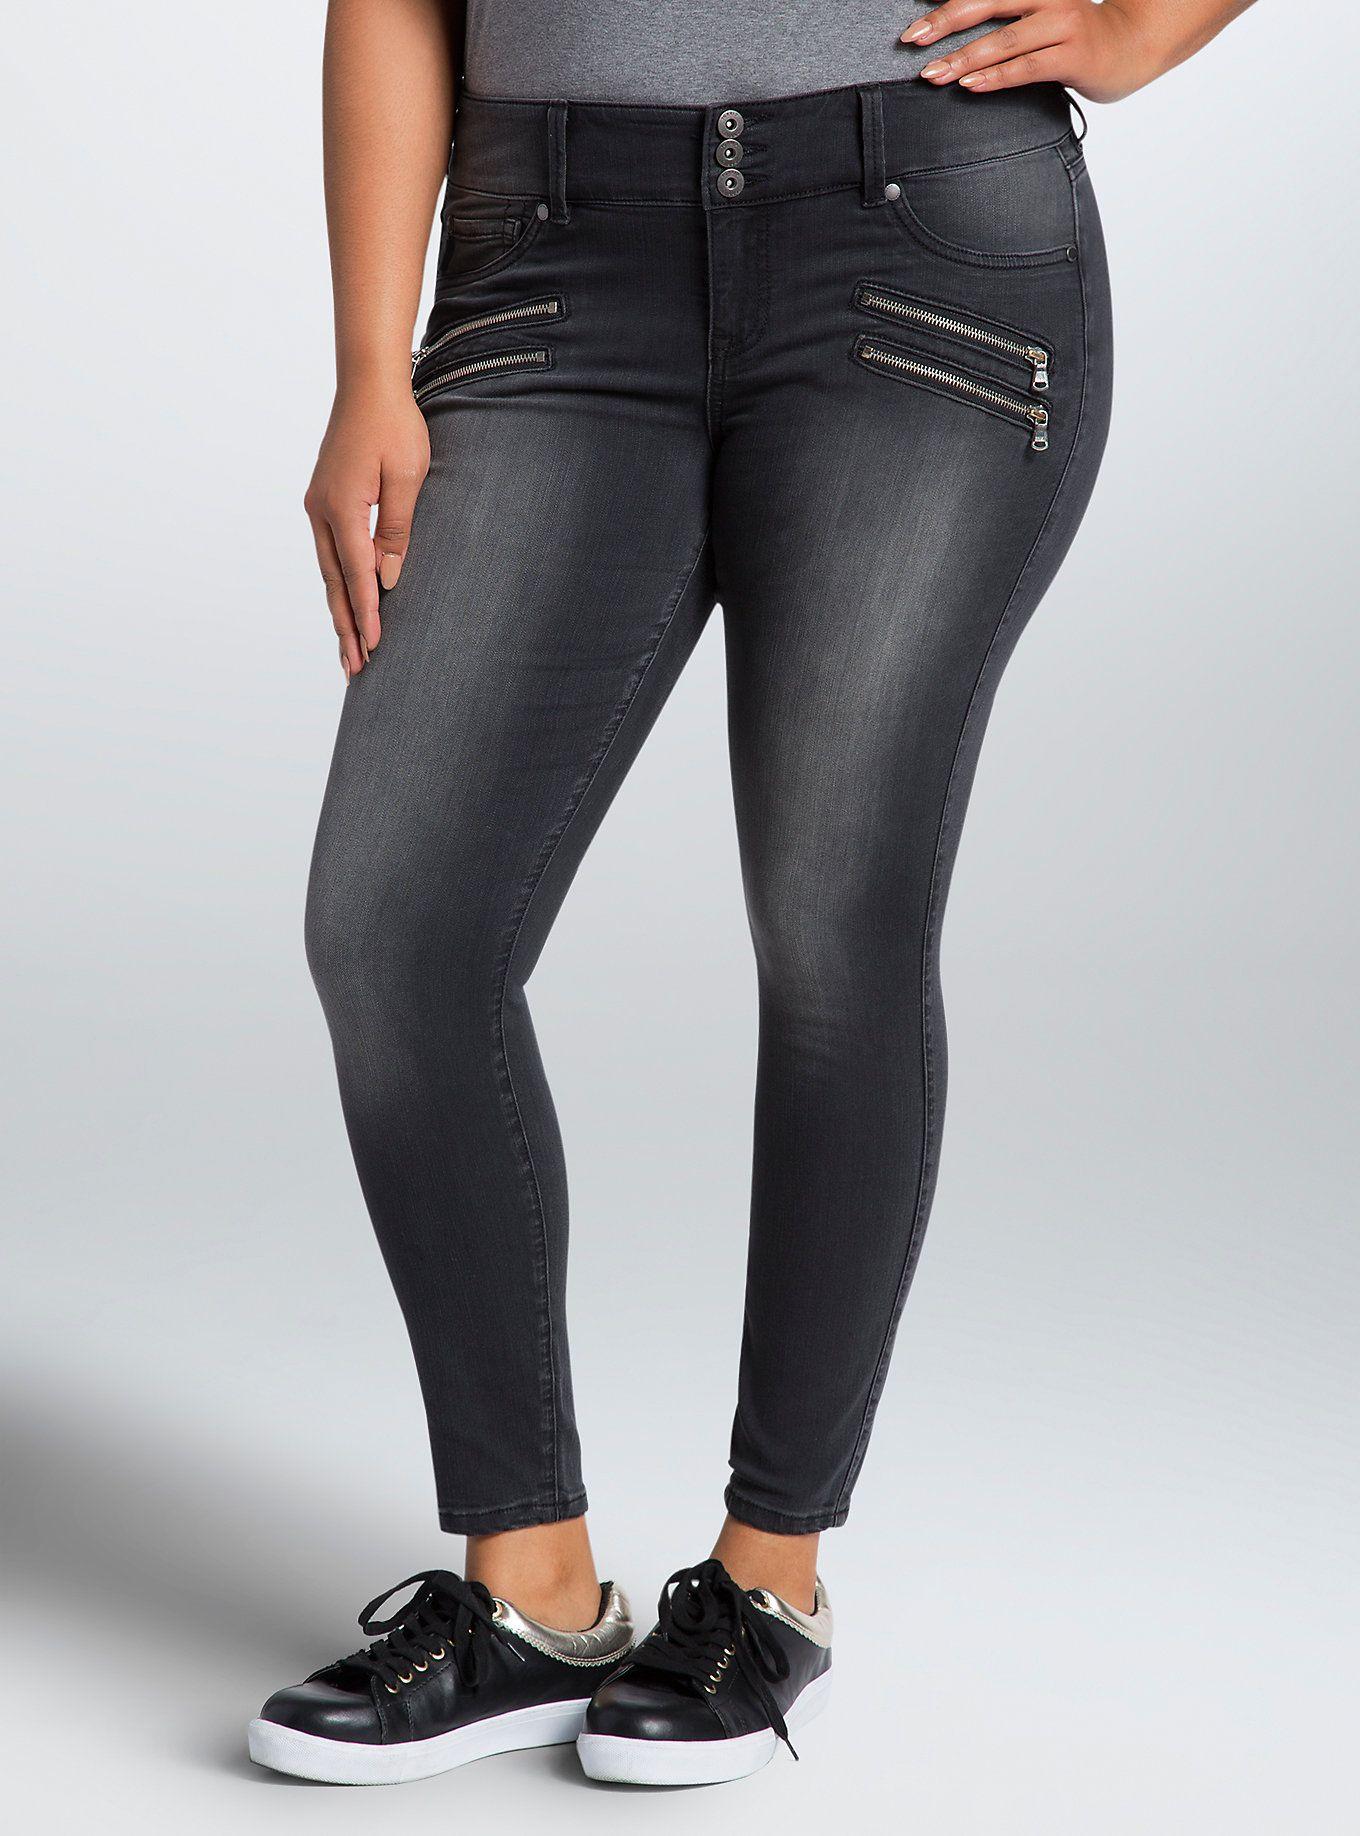 5c9fefb81c82a Torrid Multi Zip Jeggings - Black Wash (Regular)   Torrid Distressed  Leggings, Plus